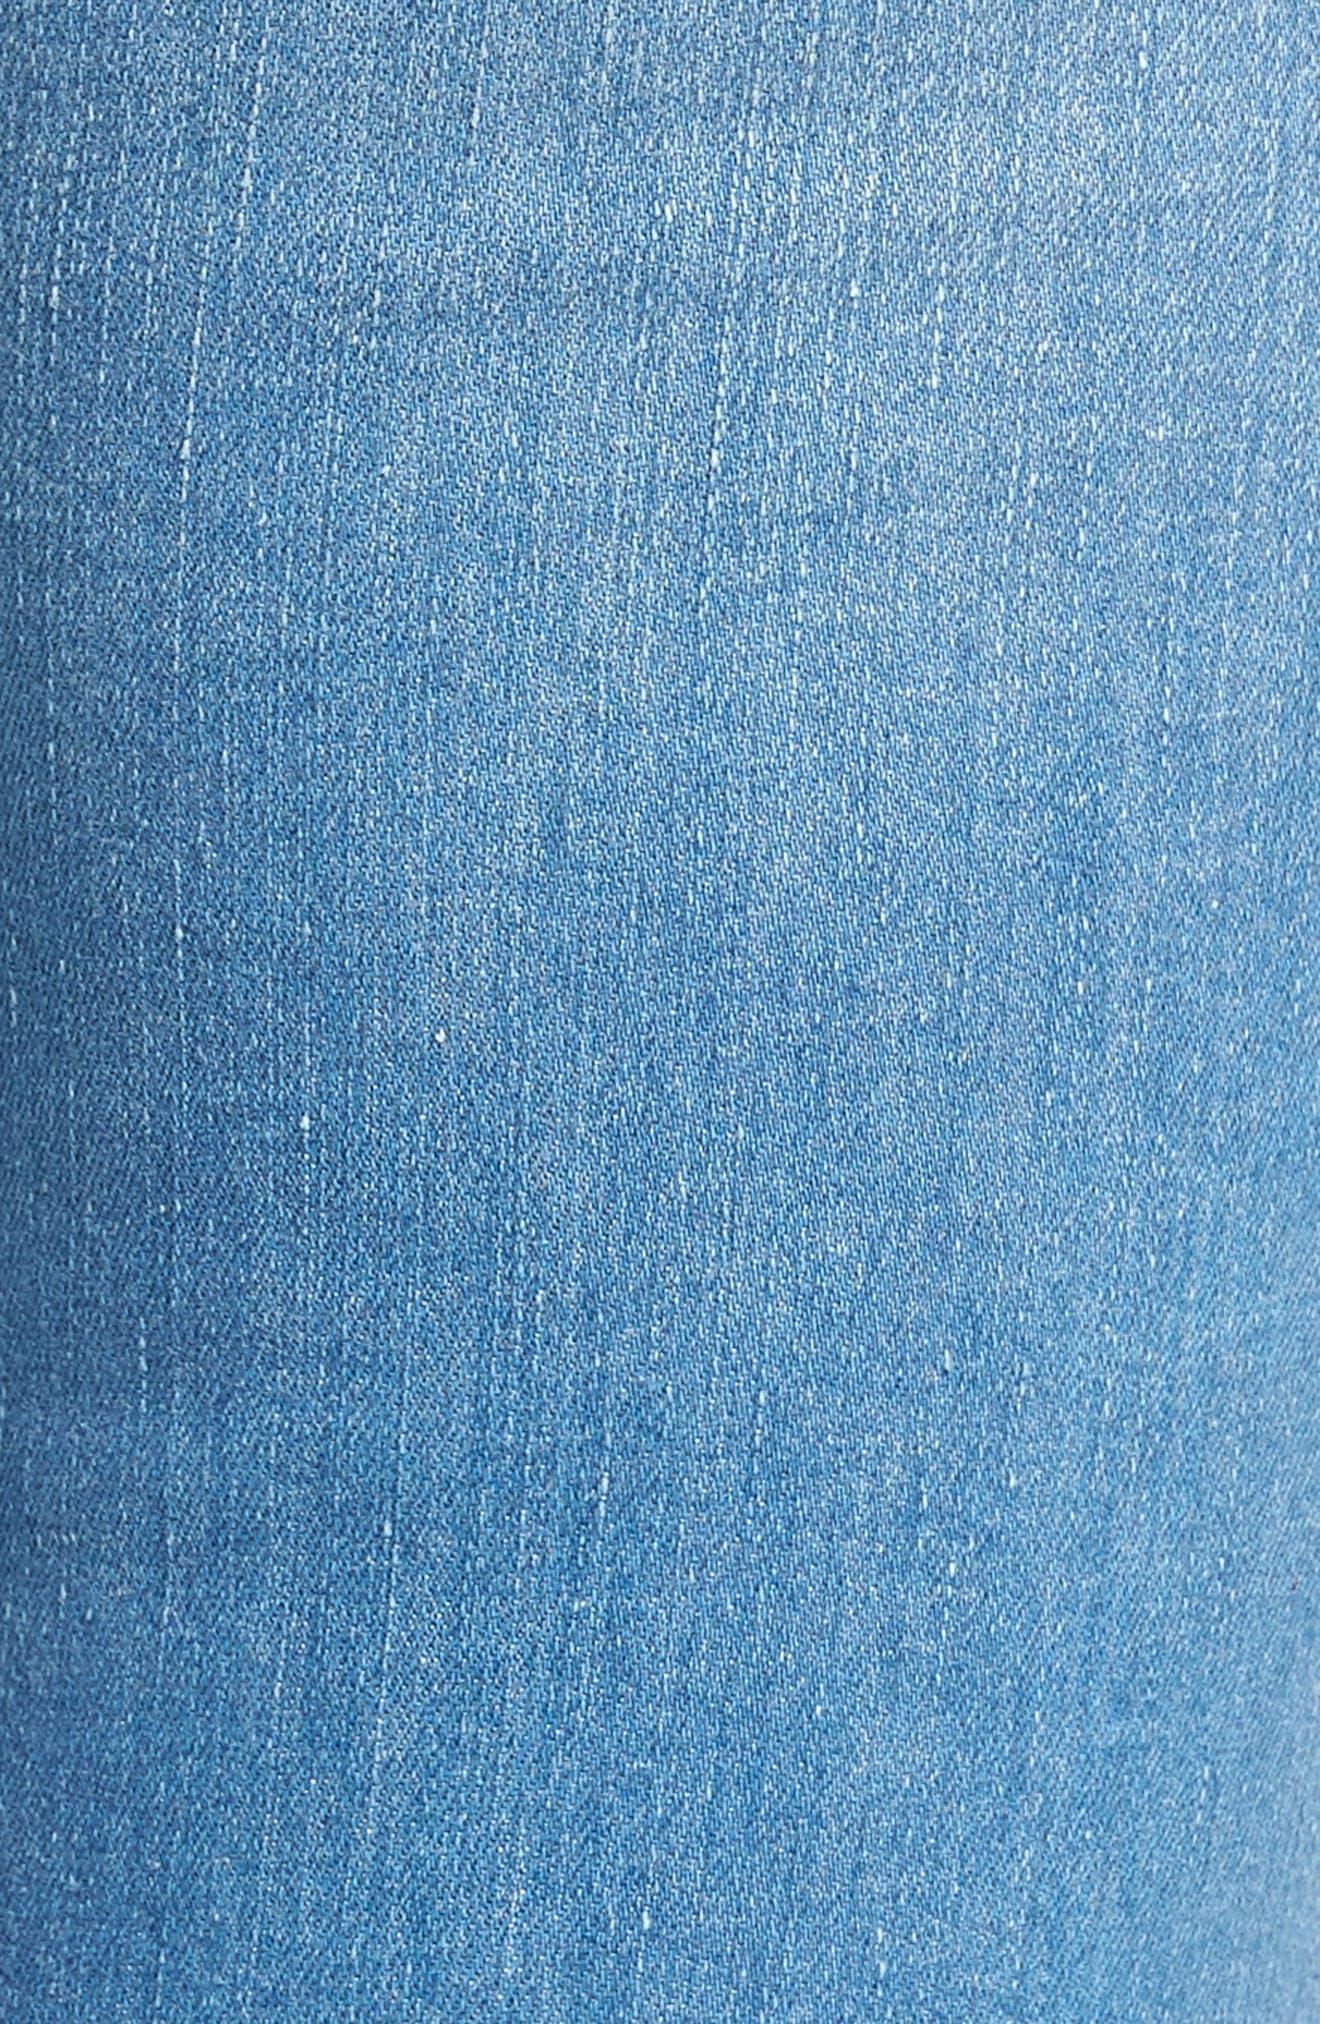 Alternate Image 4  - Madewell High Rise Skinny Jeans (Hank Wash)